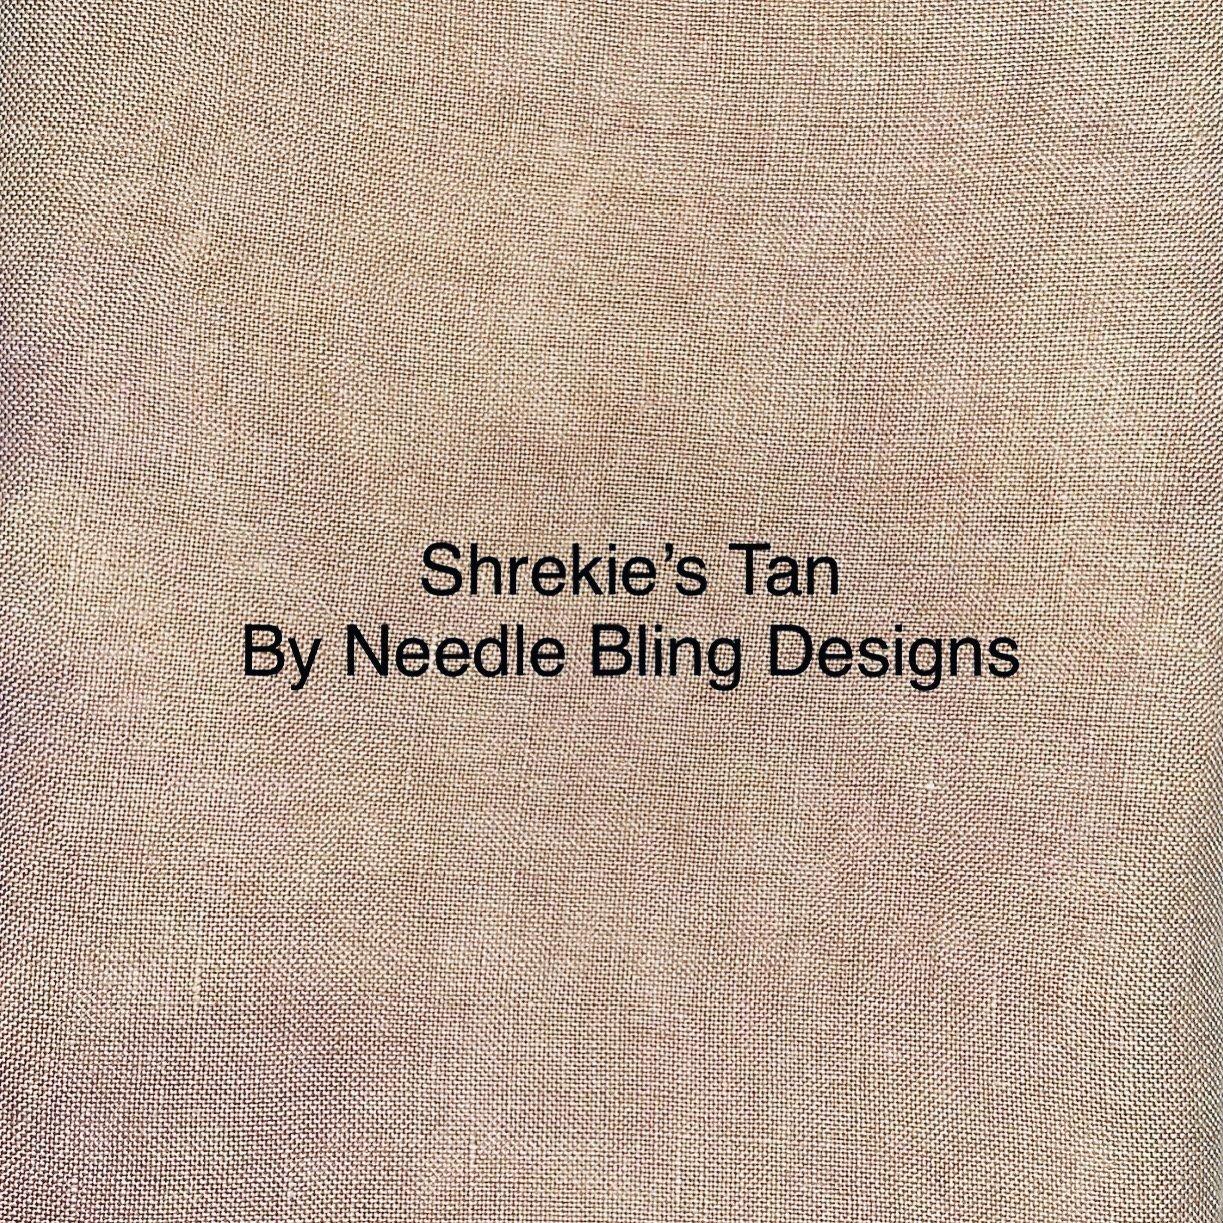 14 ct Shrekie's Tan Aida